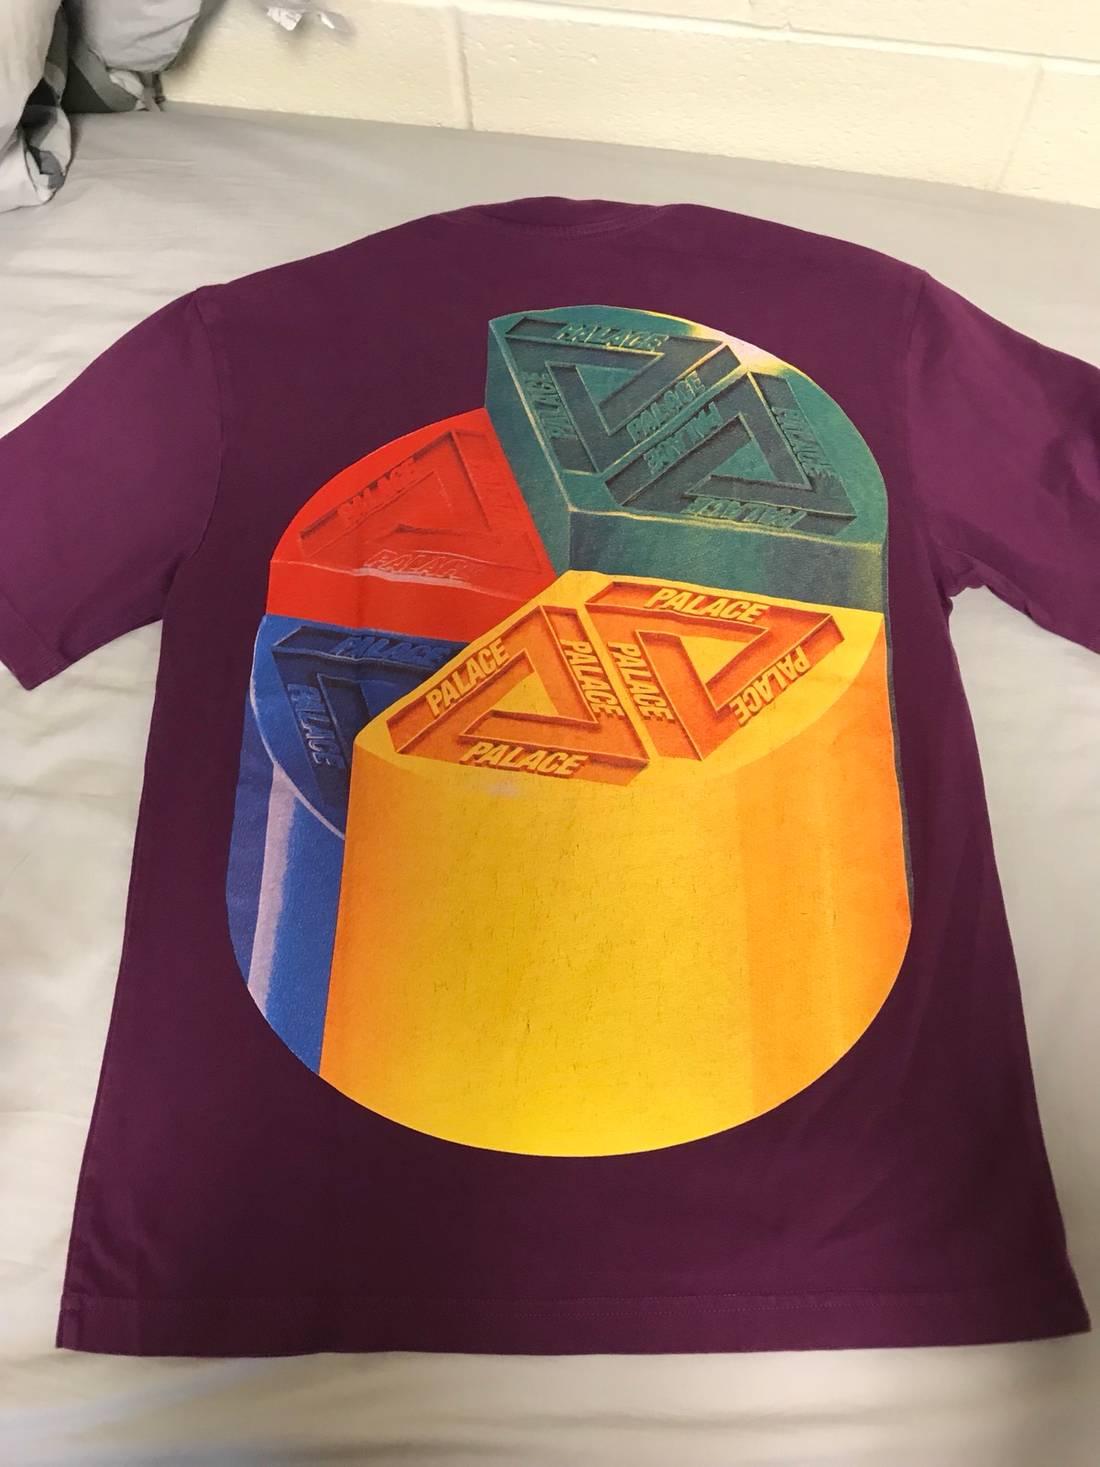 Palace palace pie chart tee size s short sleeve t shirts for sale palace palace pie chart tee size us s eu 44 46 1 nvjuhfo Image collections